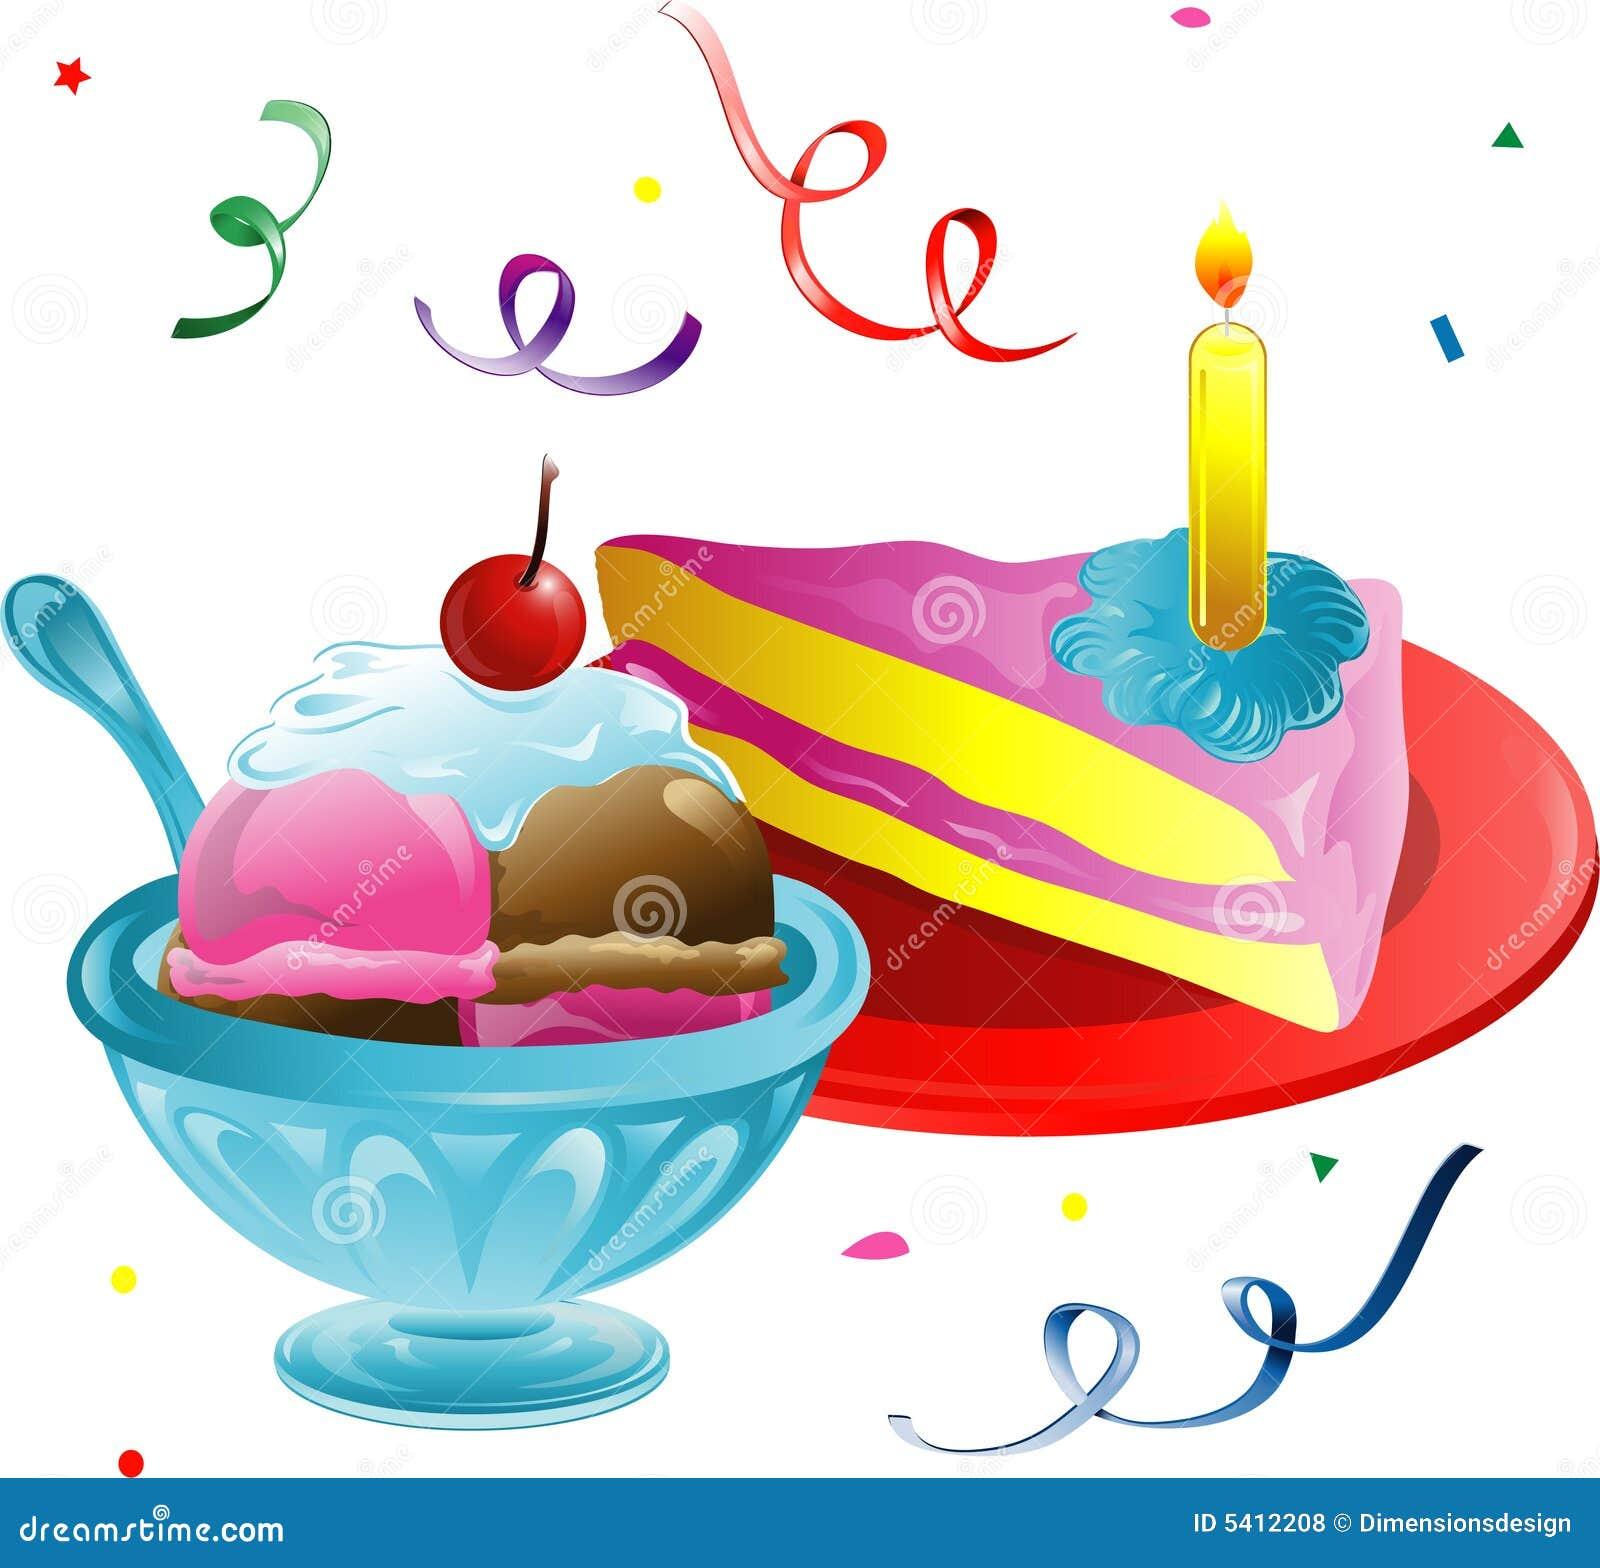 Ice Cream Cake Balloons Images